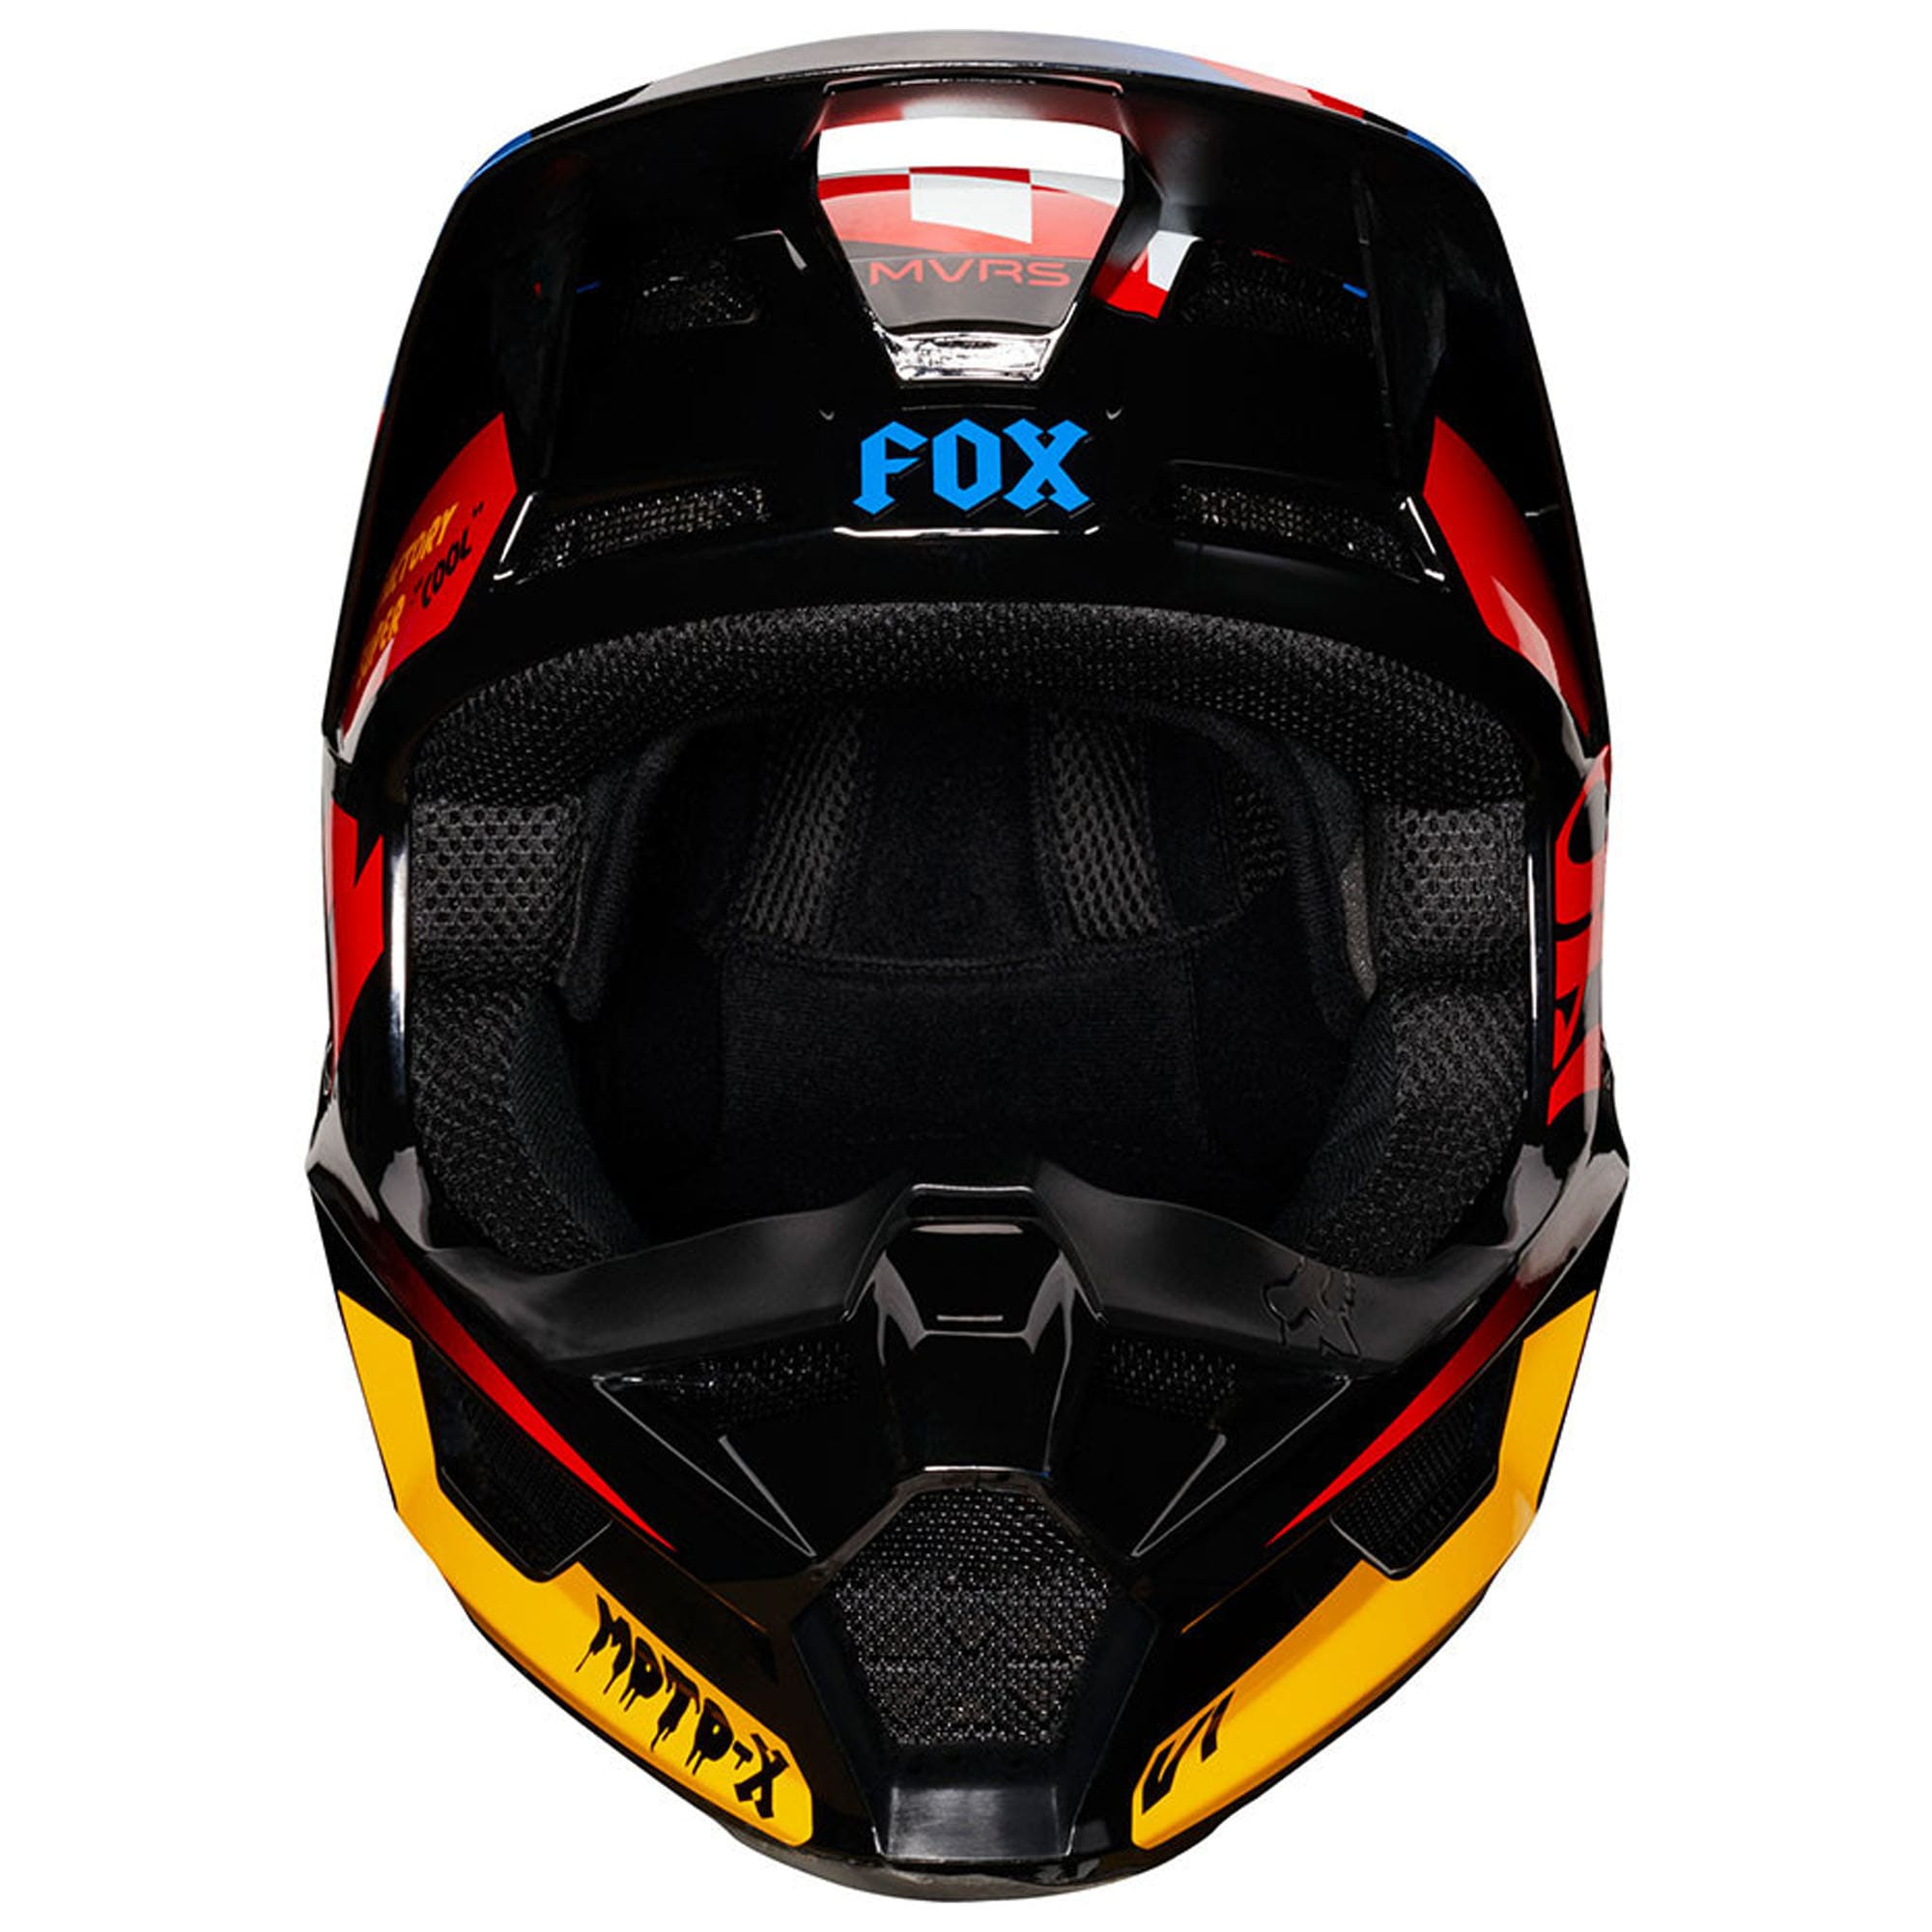 Capacete Fox V1 MVRS Czar Juvenil  - HP Race Off Road